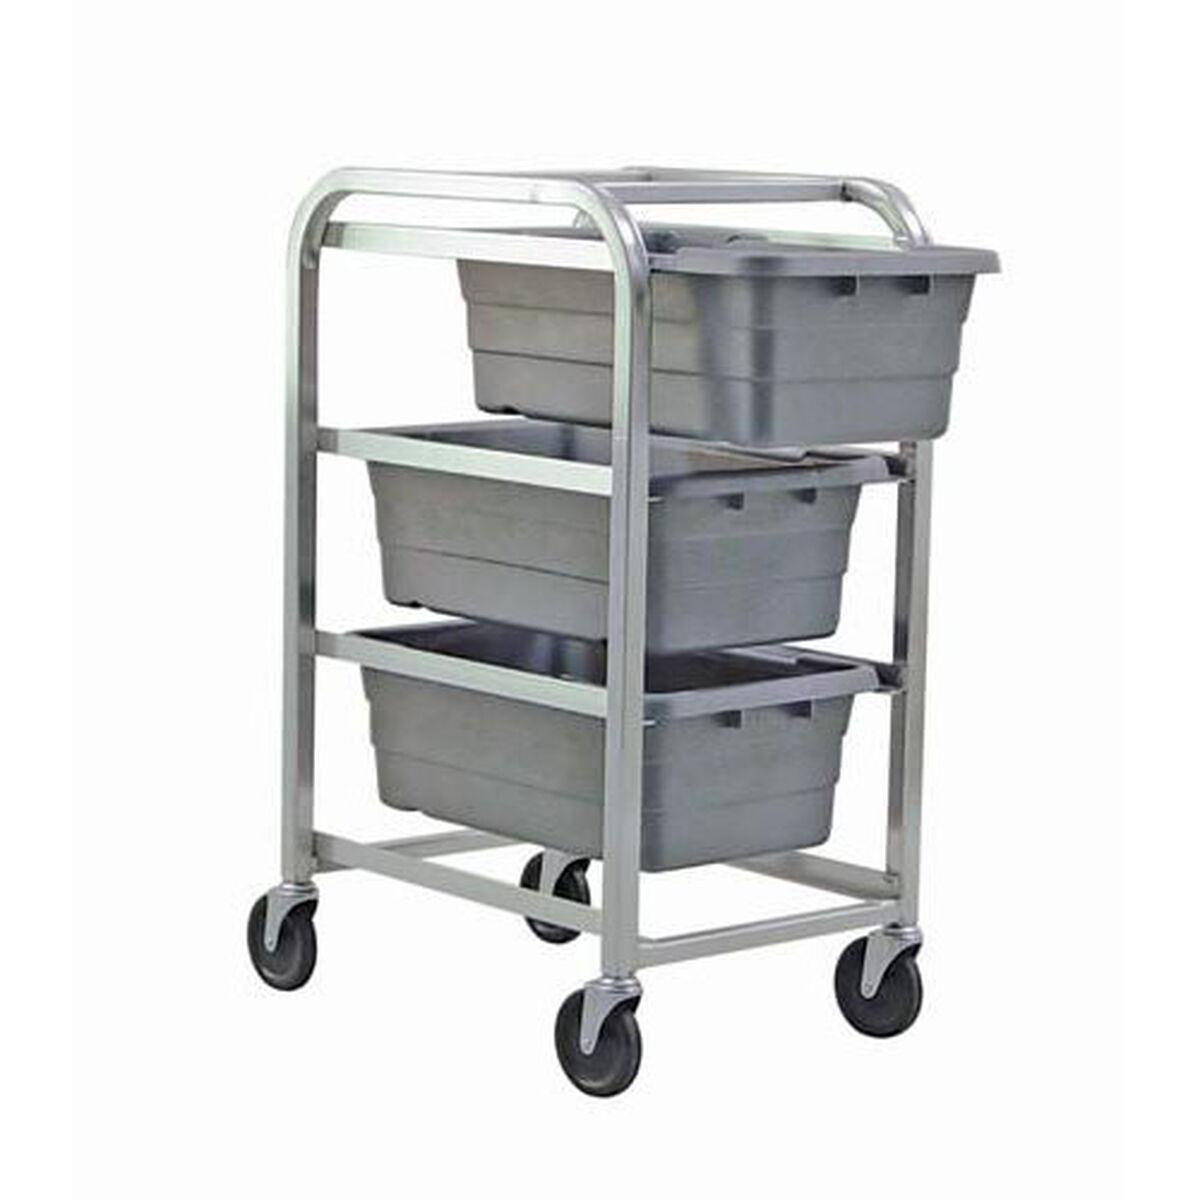 Aluminium Tub Rack with Casters TR3-2516-8-GY | Bizchair.com